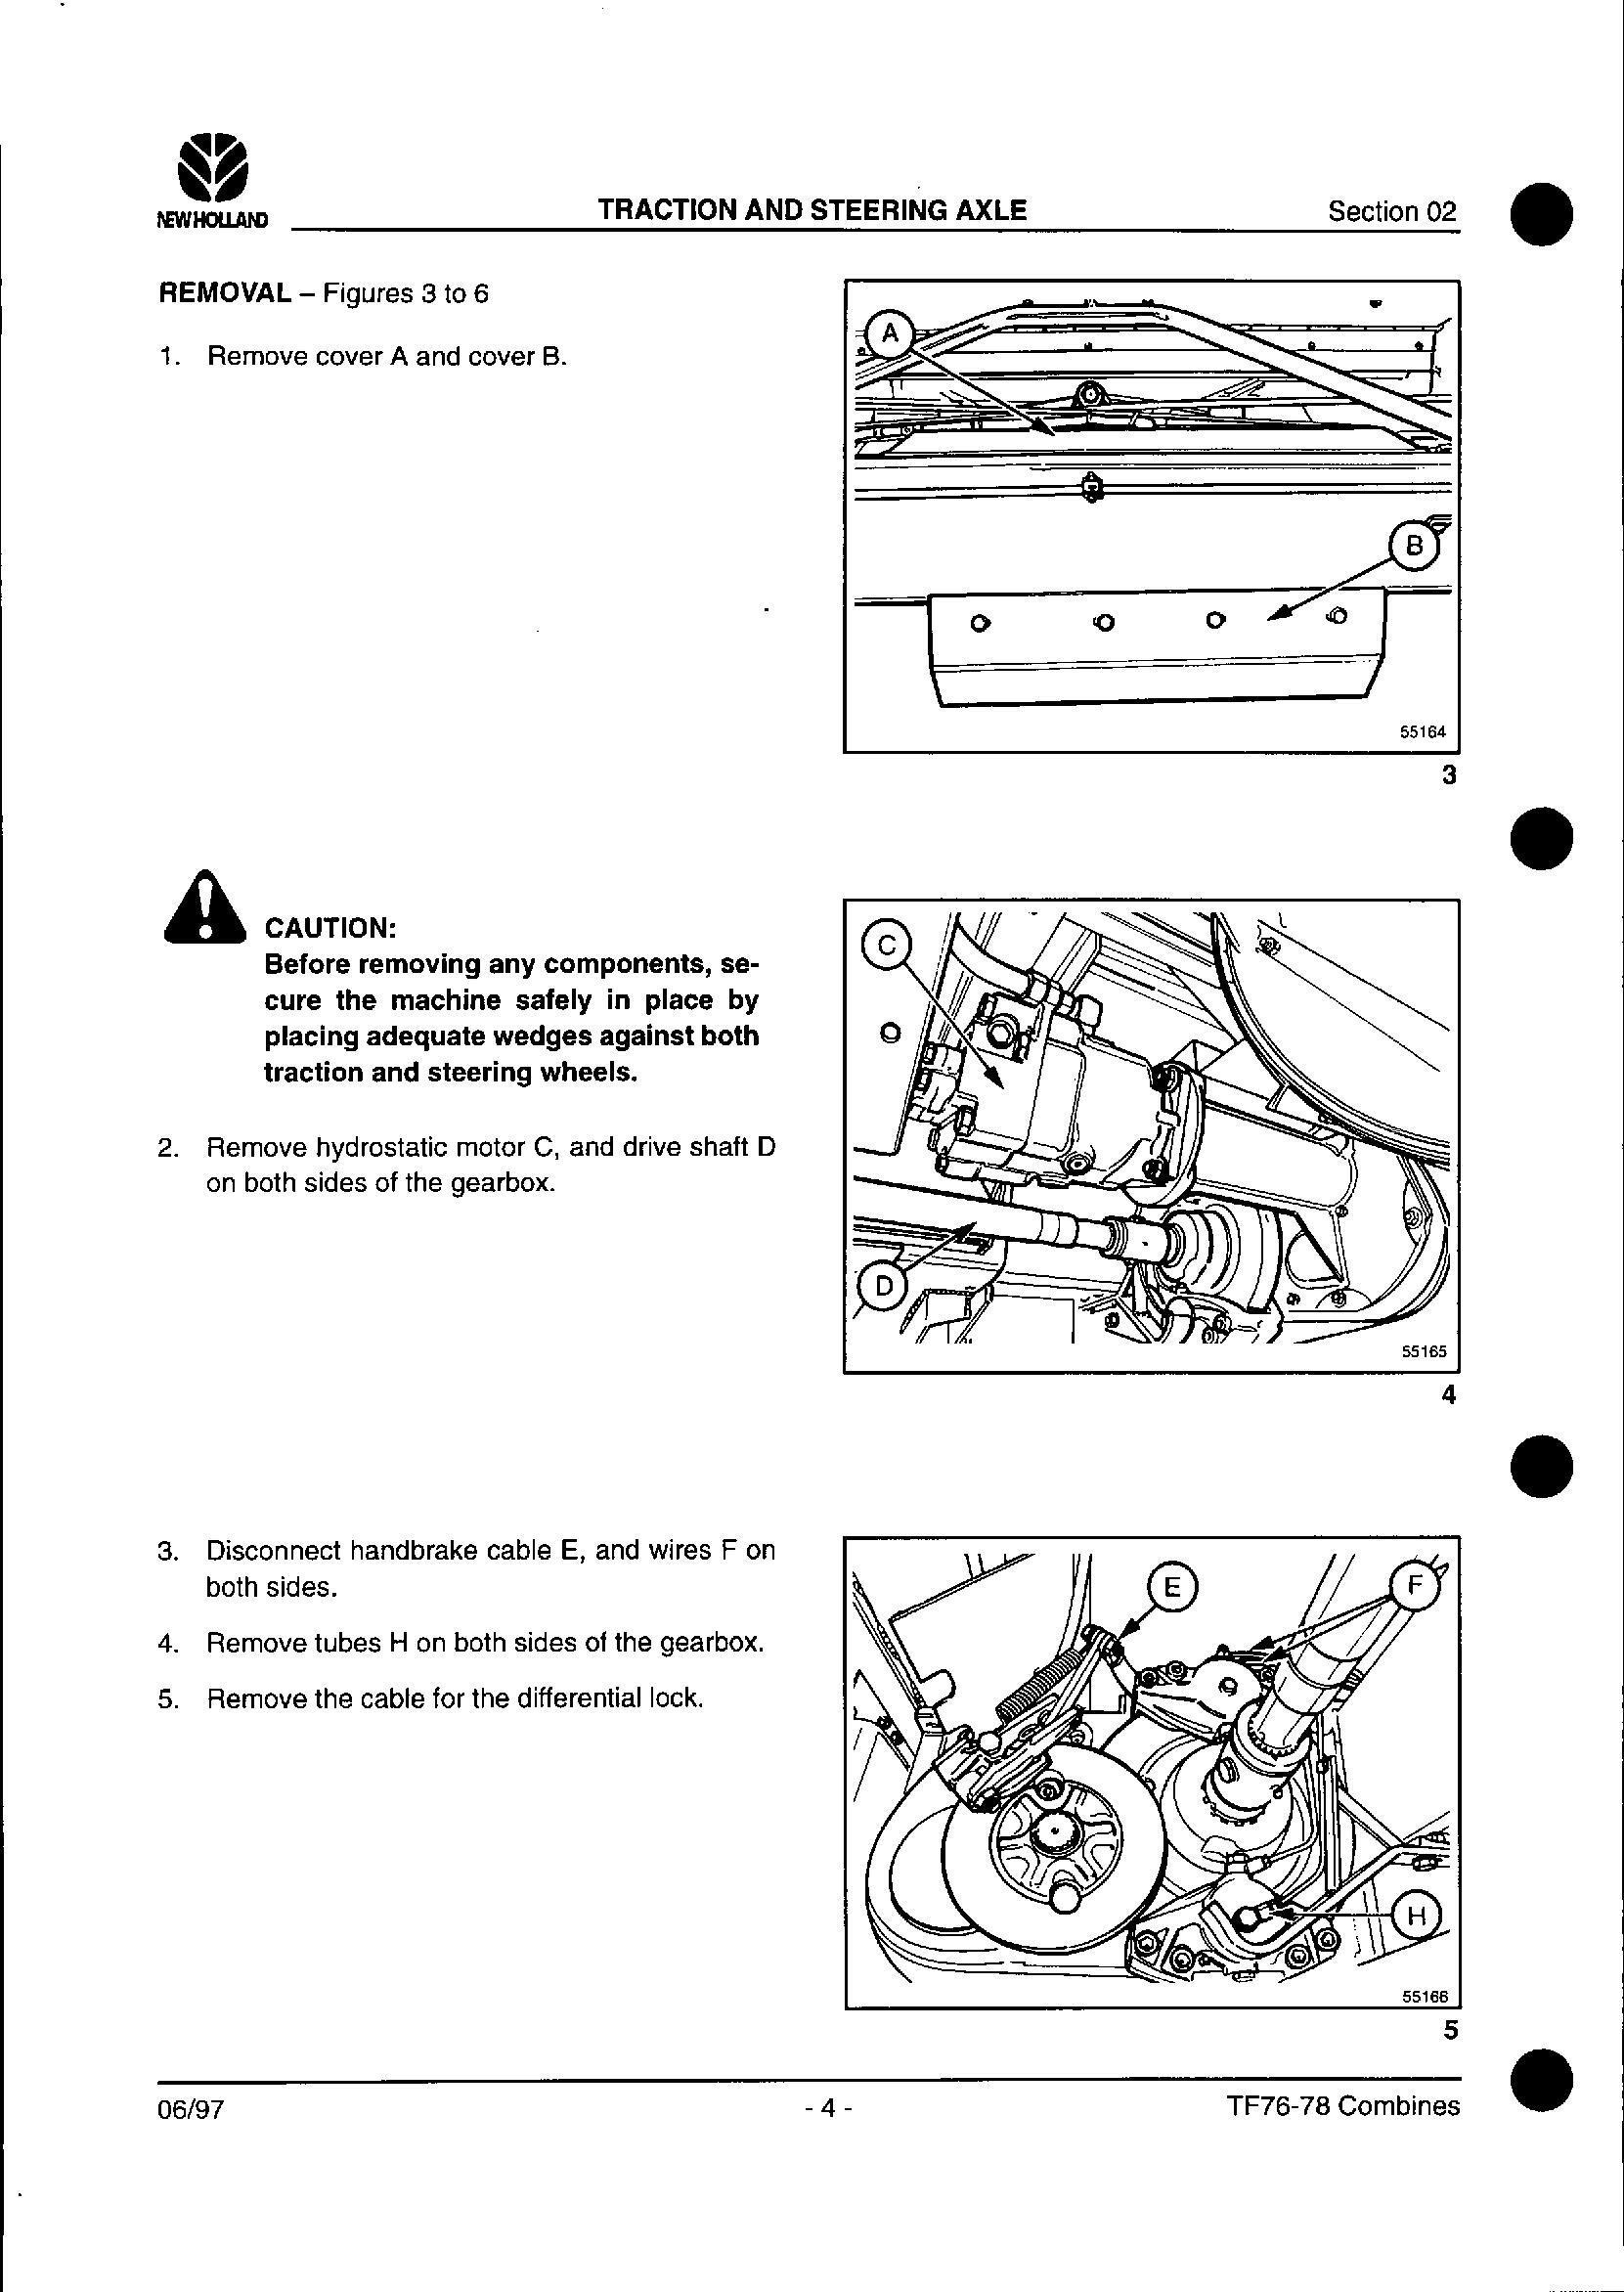 New Holland TF76, TF78 Combine Service Manual - 1